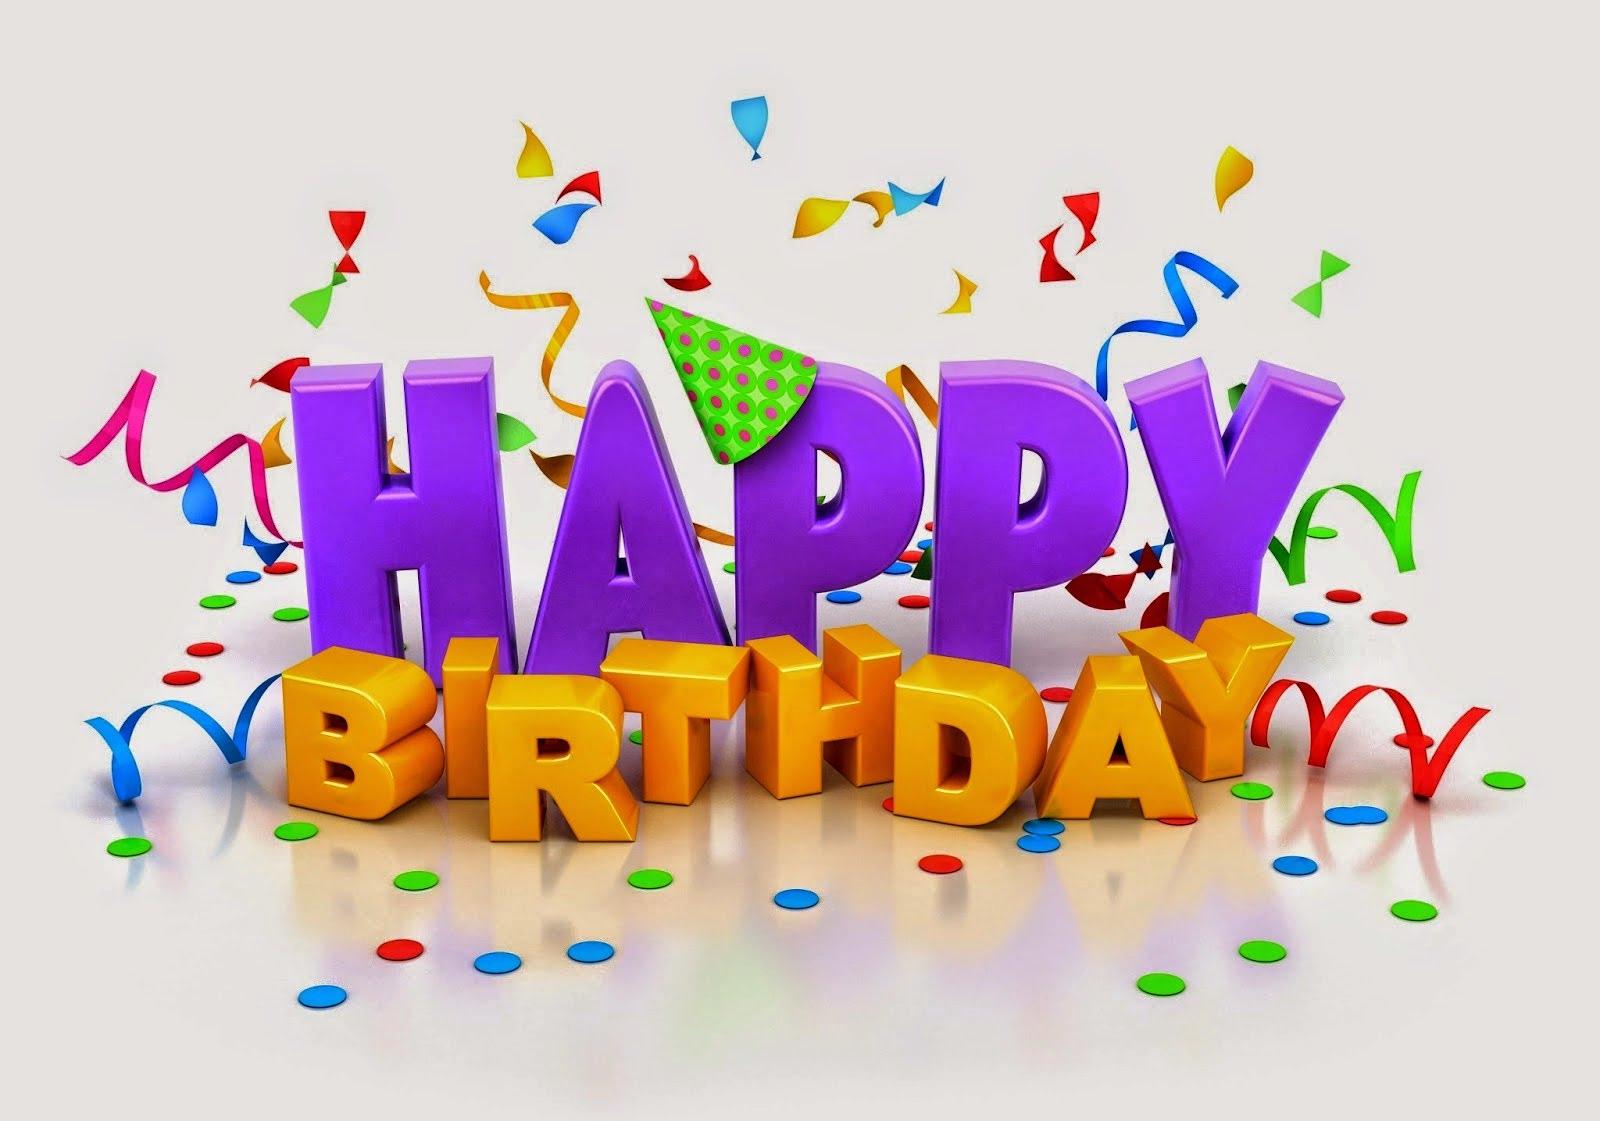 Pleasant Tomorrow Is My Birthday Wallpaper Whatsapp Happy Birthday Wishes Funny Birthday Cards Online Necthendildamsfinfo